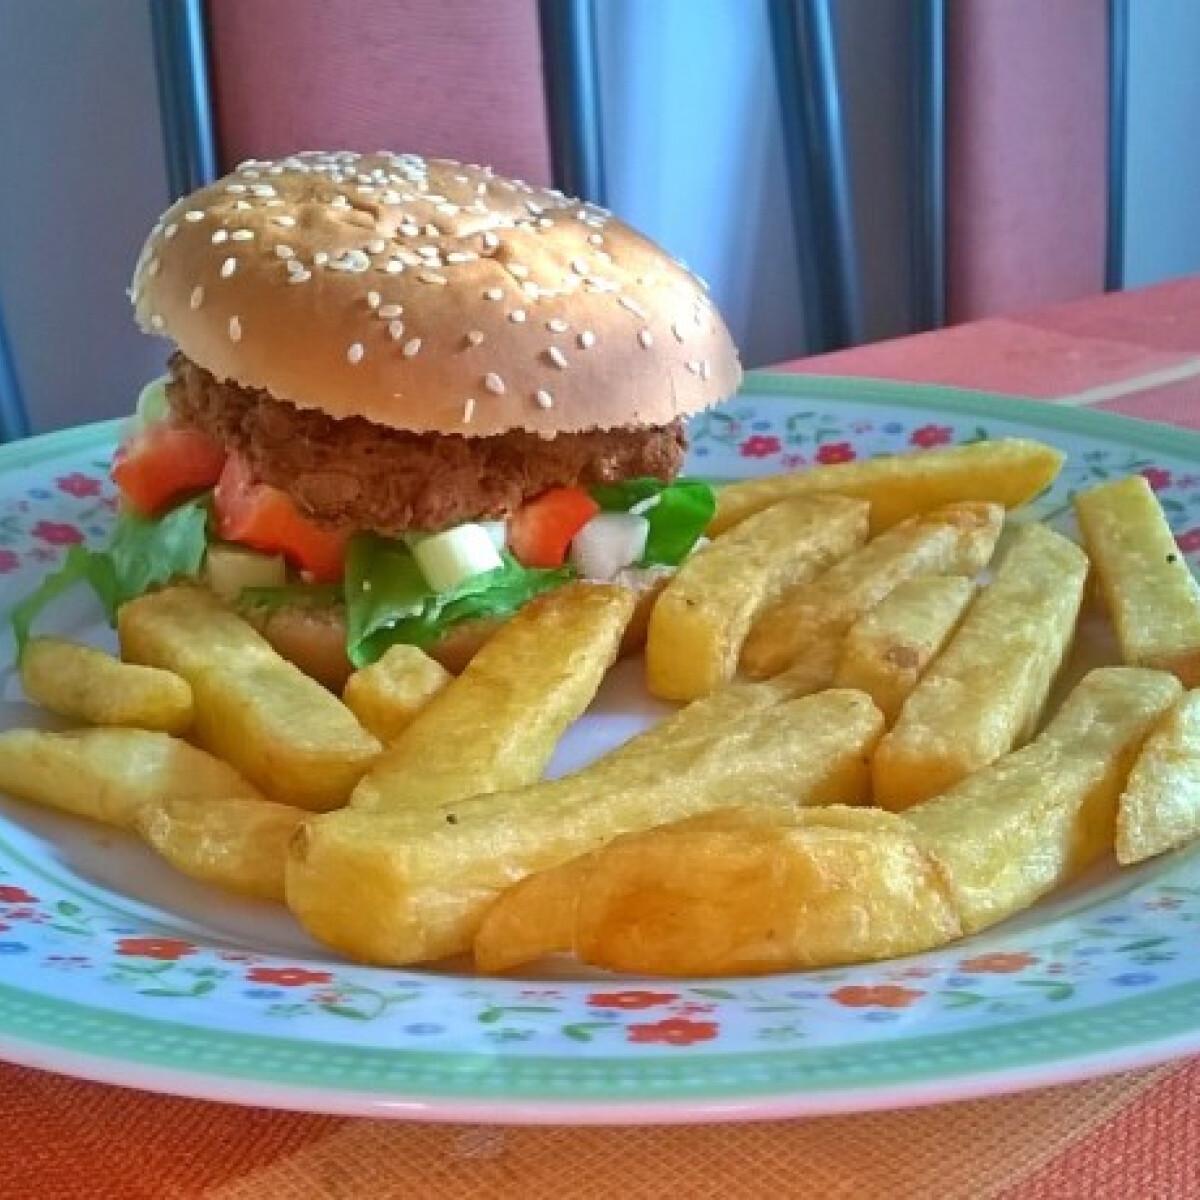 Ezen a képen: Vega burger